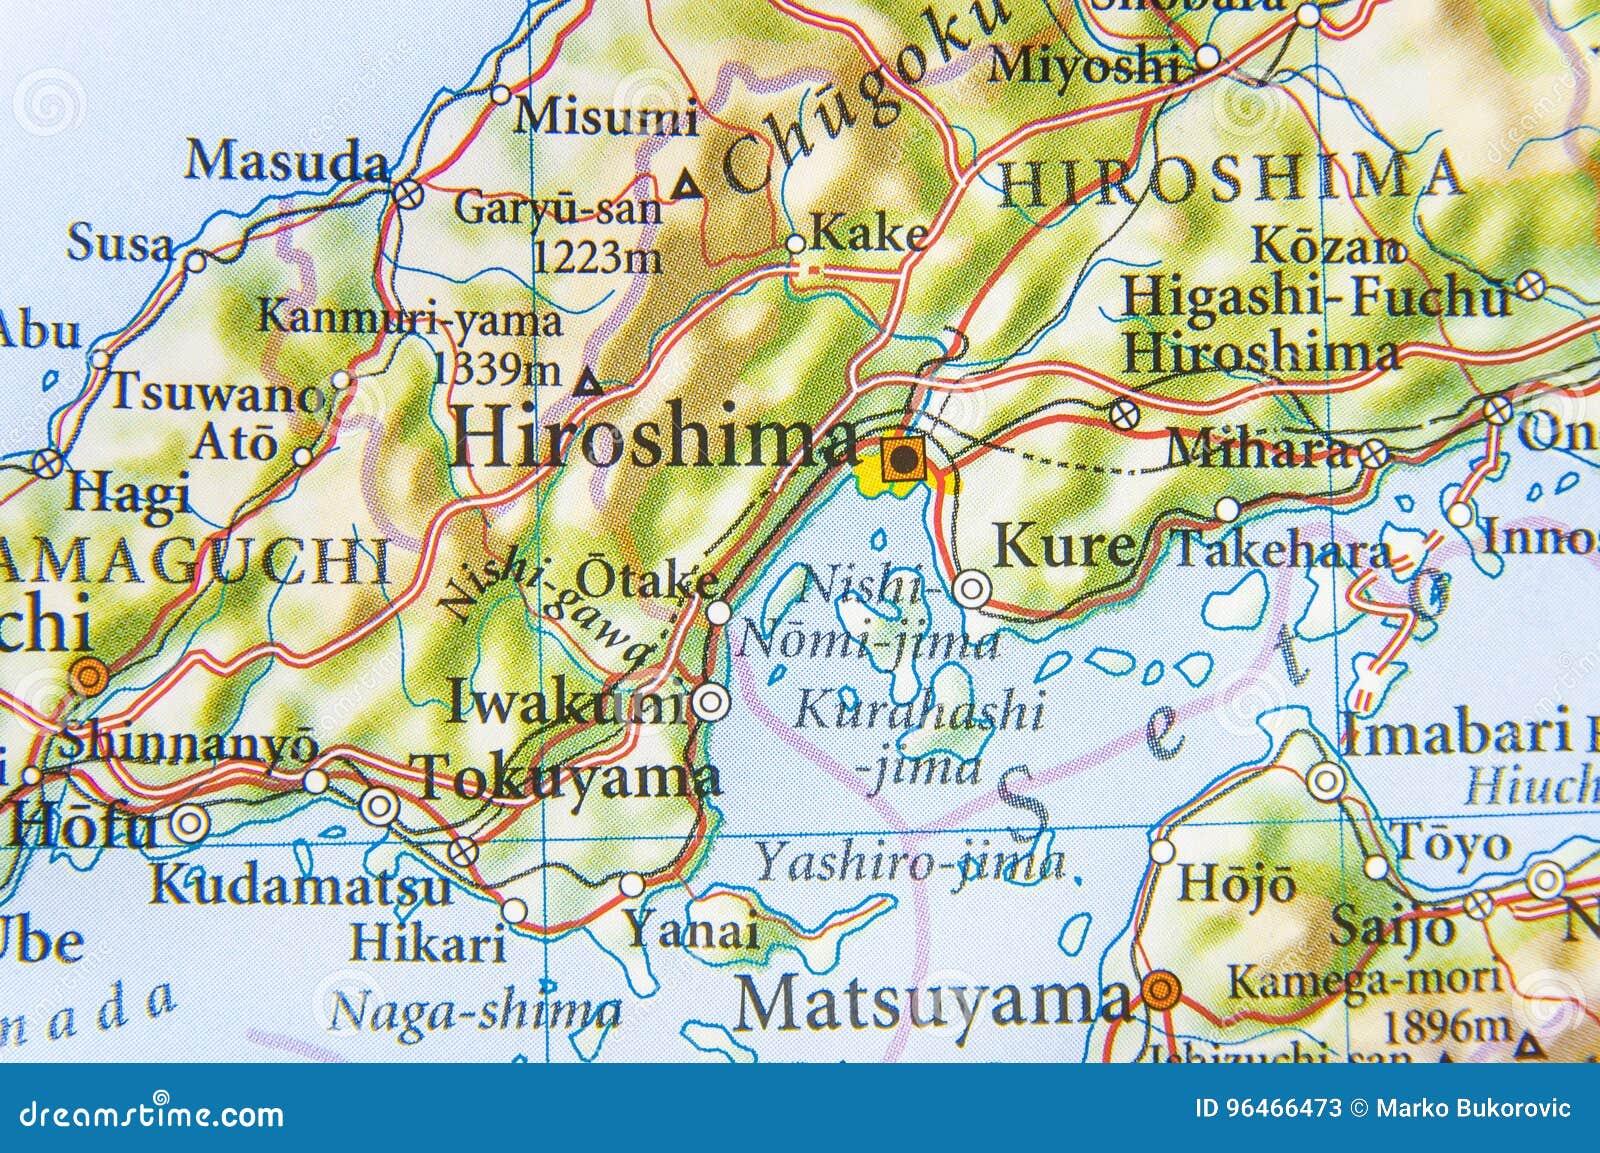 Hiroshima Map Of Japan.Geographic Map Of Japan With City Hiroshima Stock Image Image Of